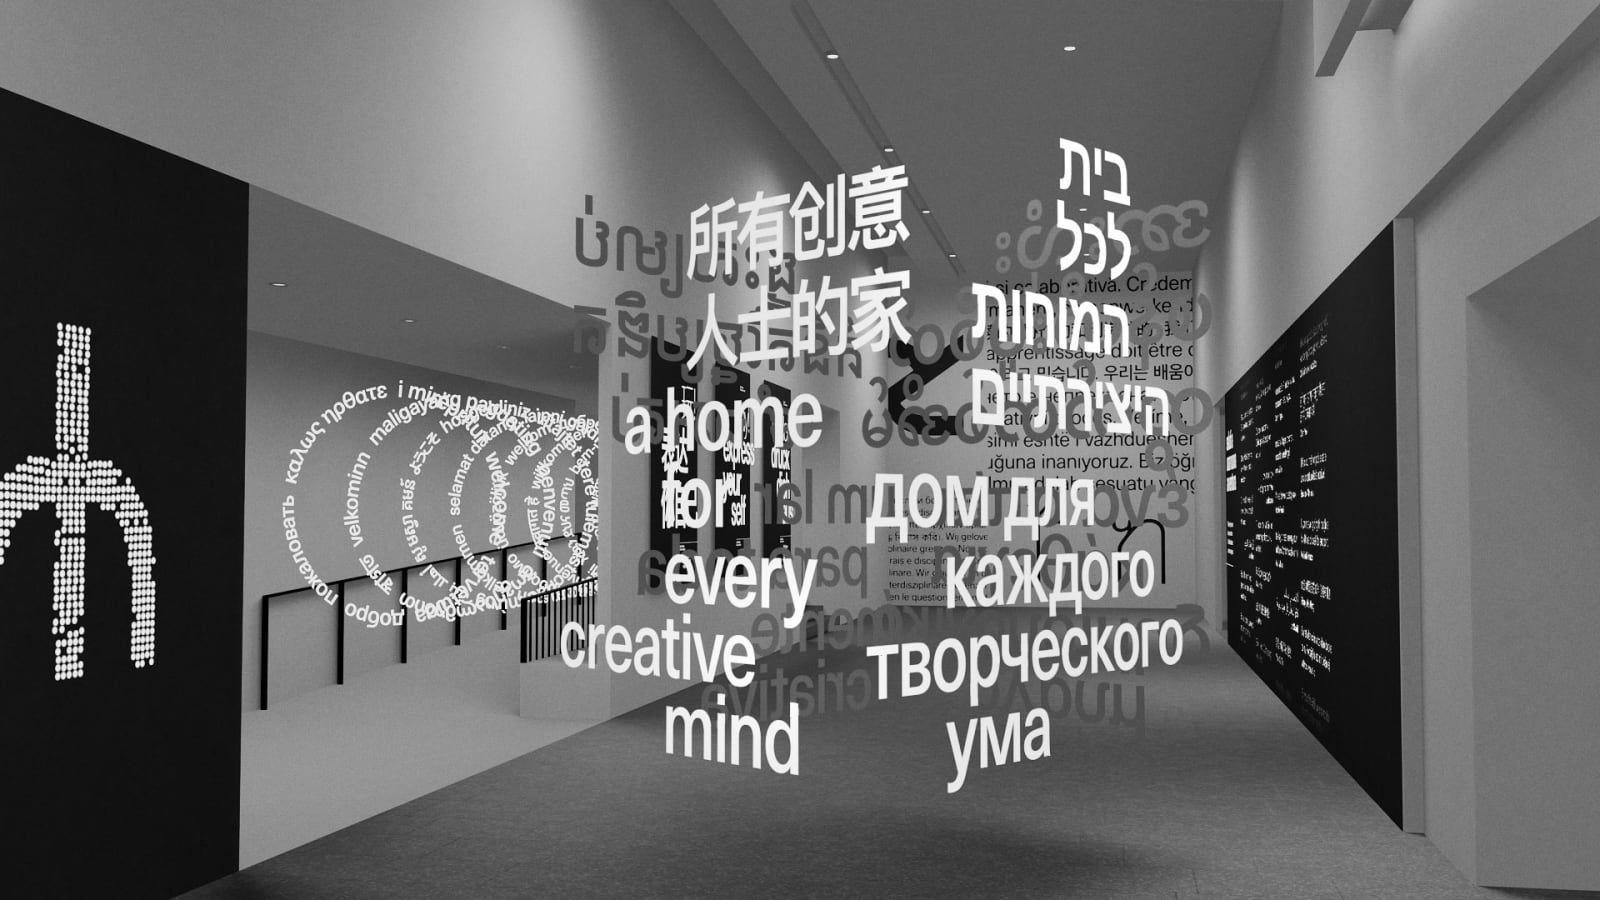 Image credit: The Languages Around Us - Filipe Peregrino.